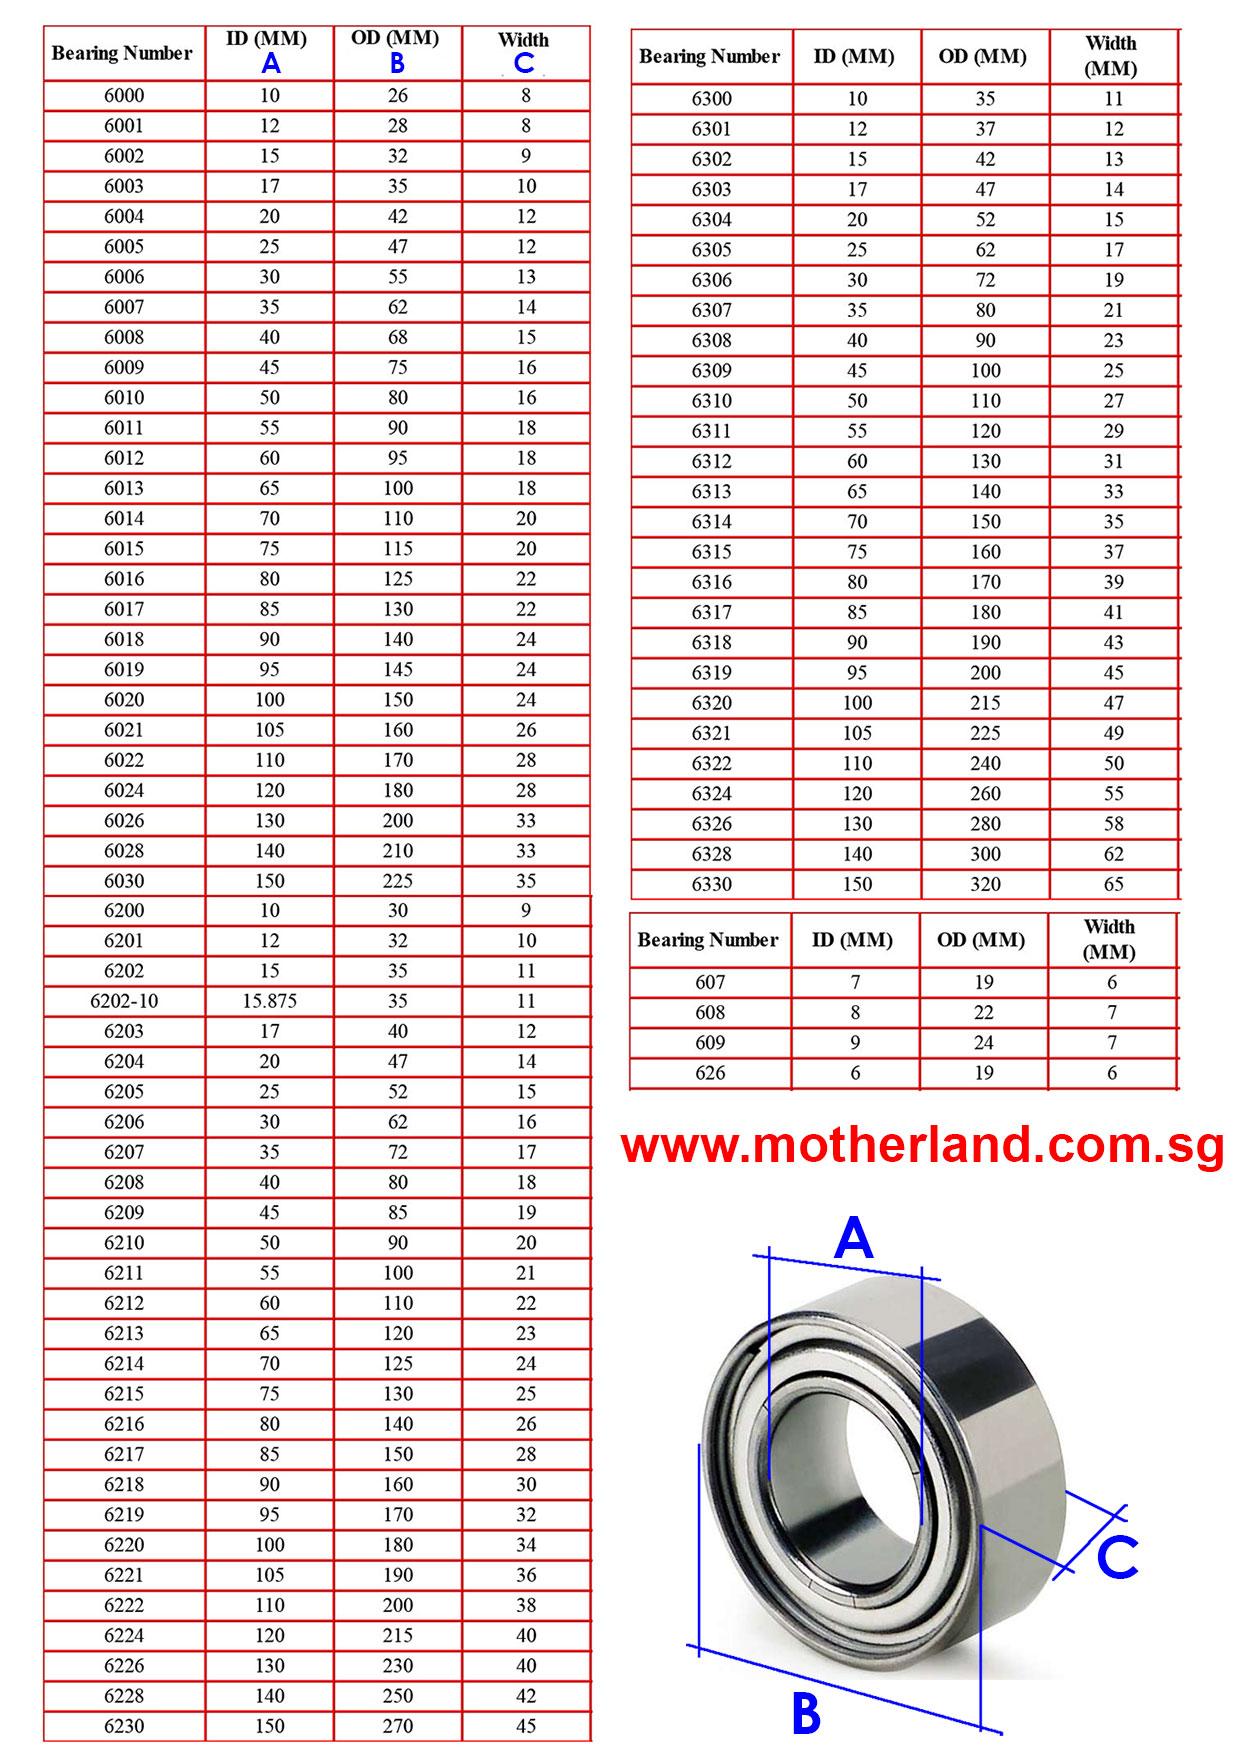 Bearing Size Chart : Bearing size chart tapered roller bearings